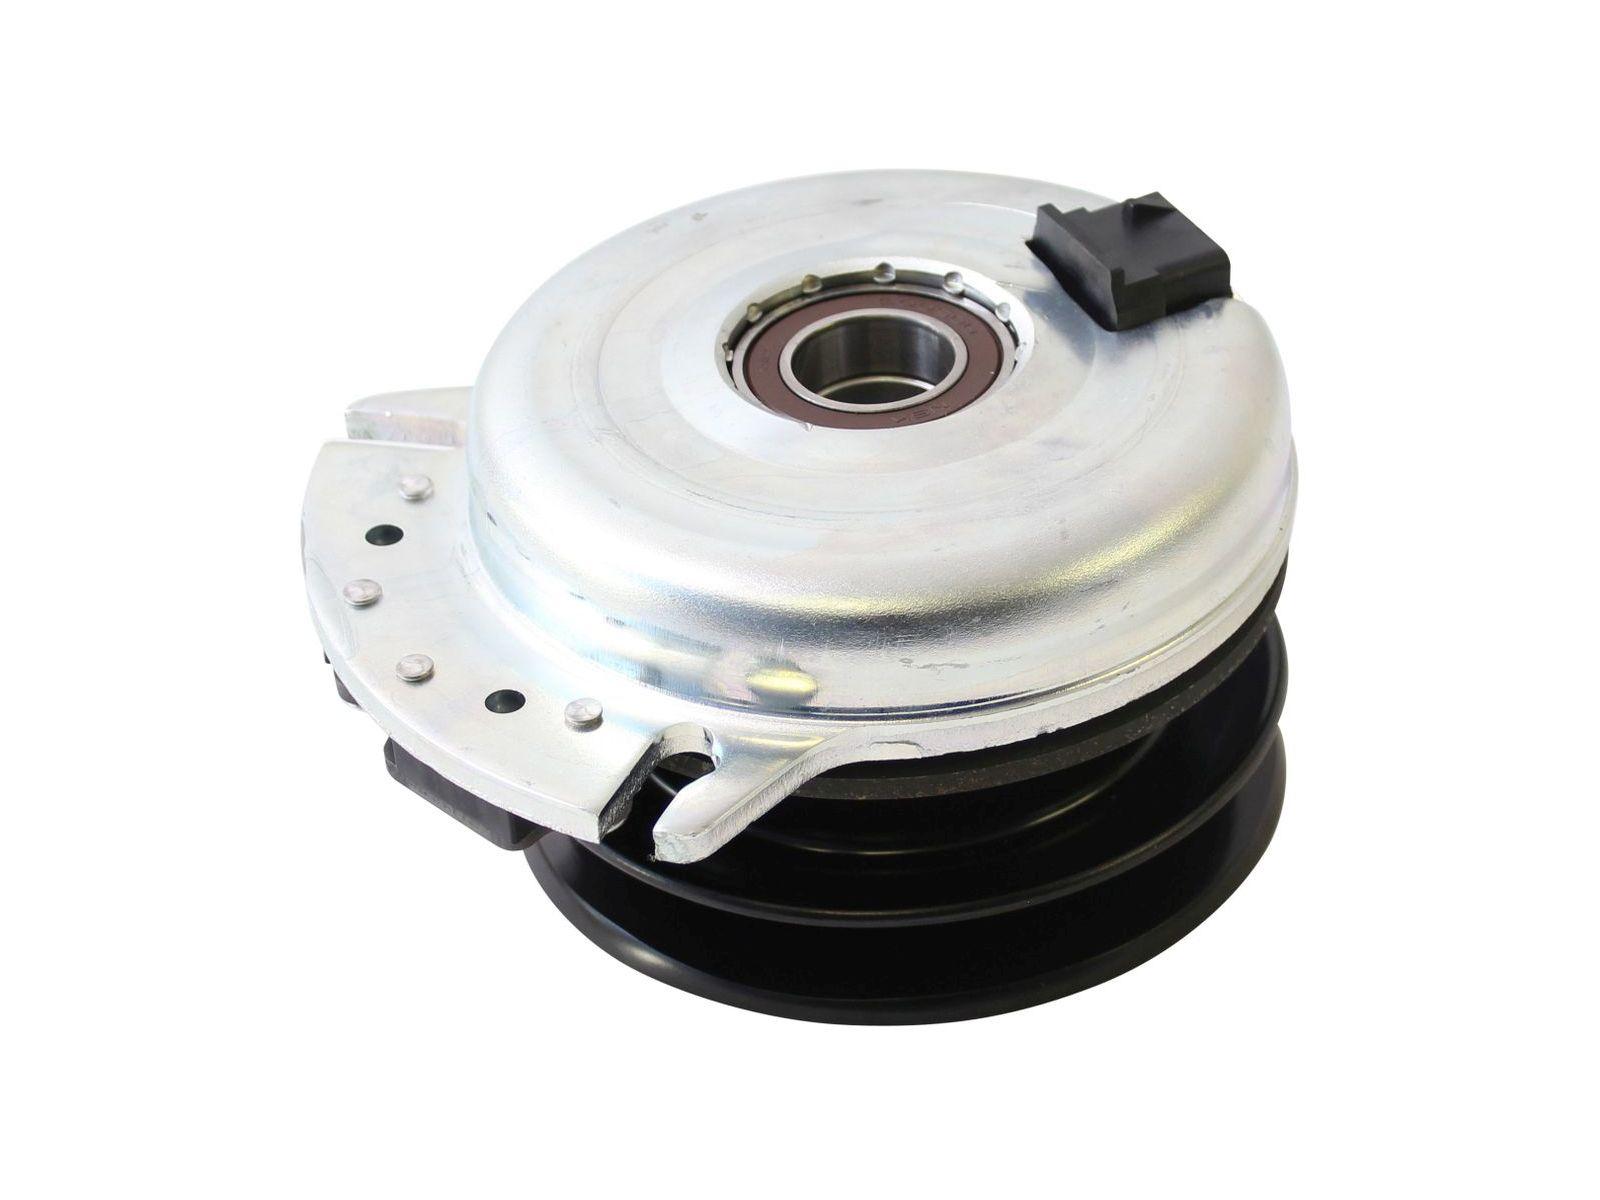 Ventilfeder für Deutz F1L612 F2L612 D25  Traktor Ventil Feder FL 612 Motor 60